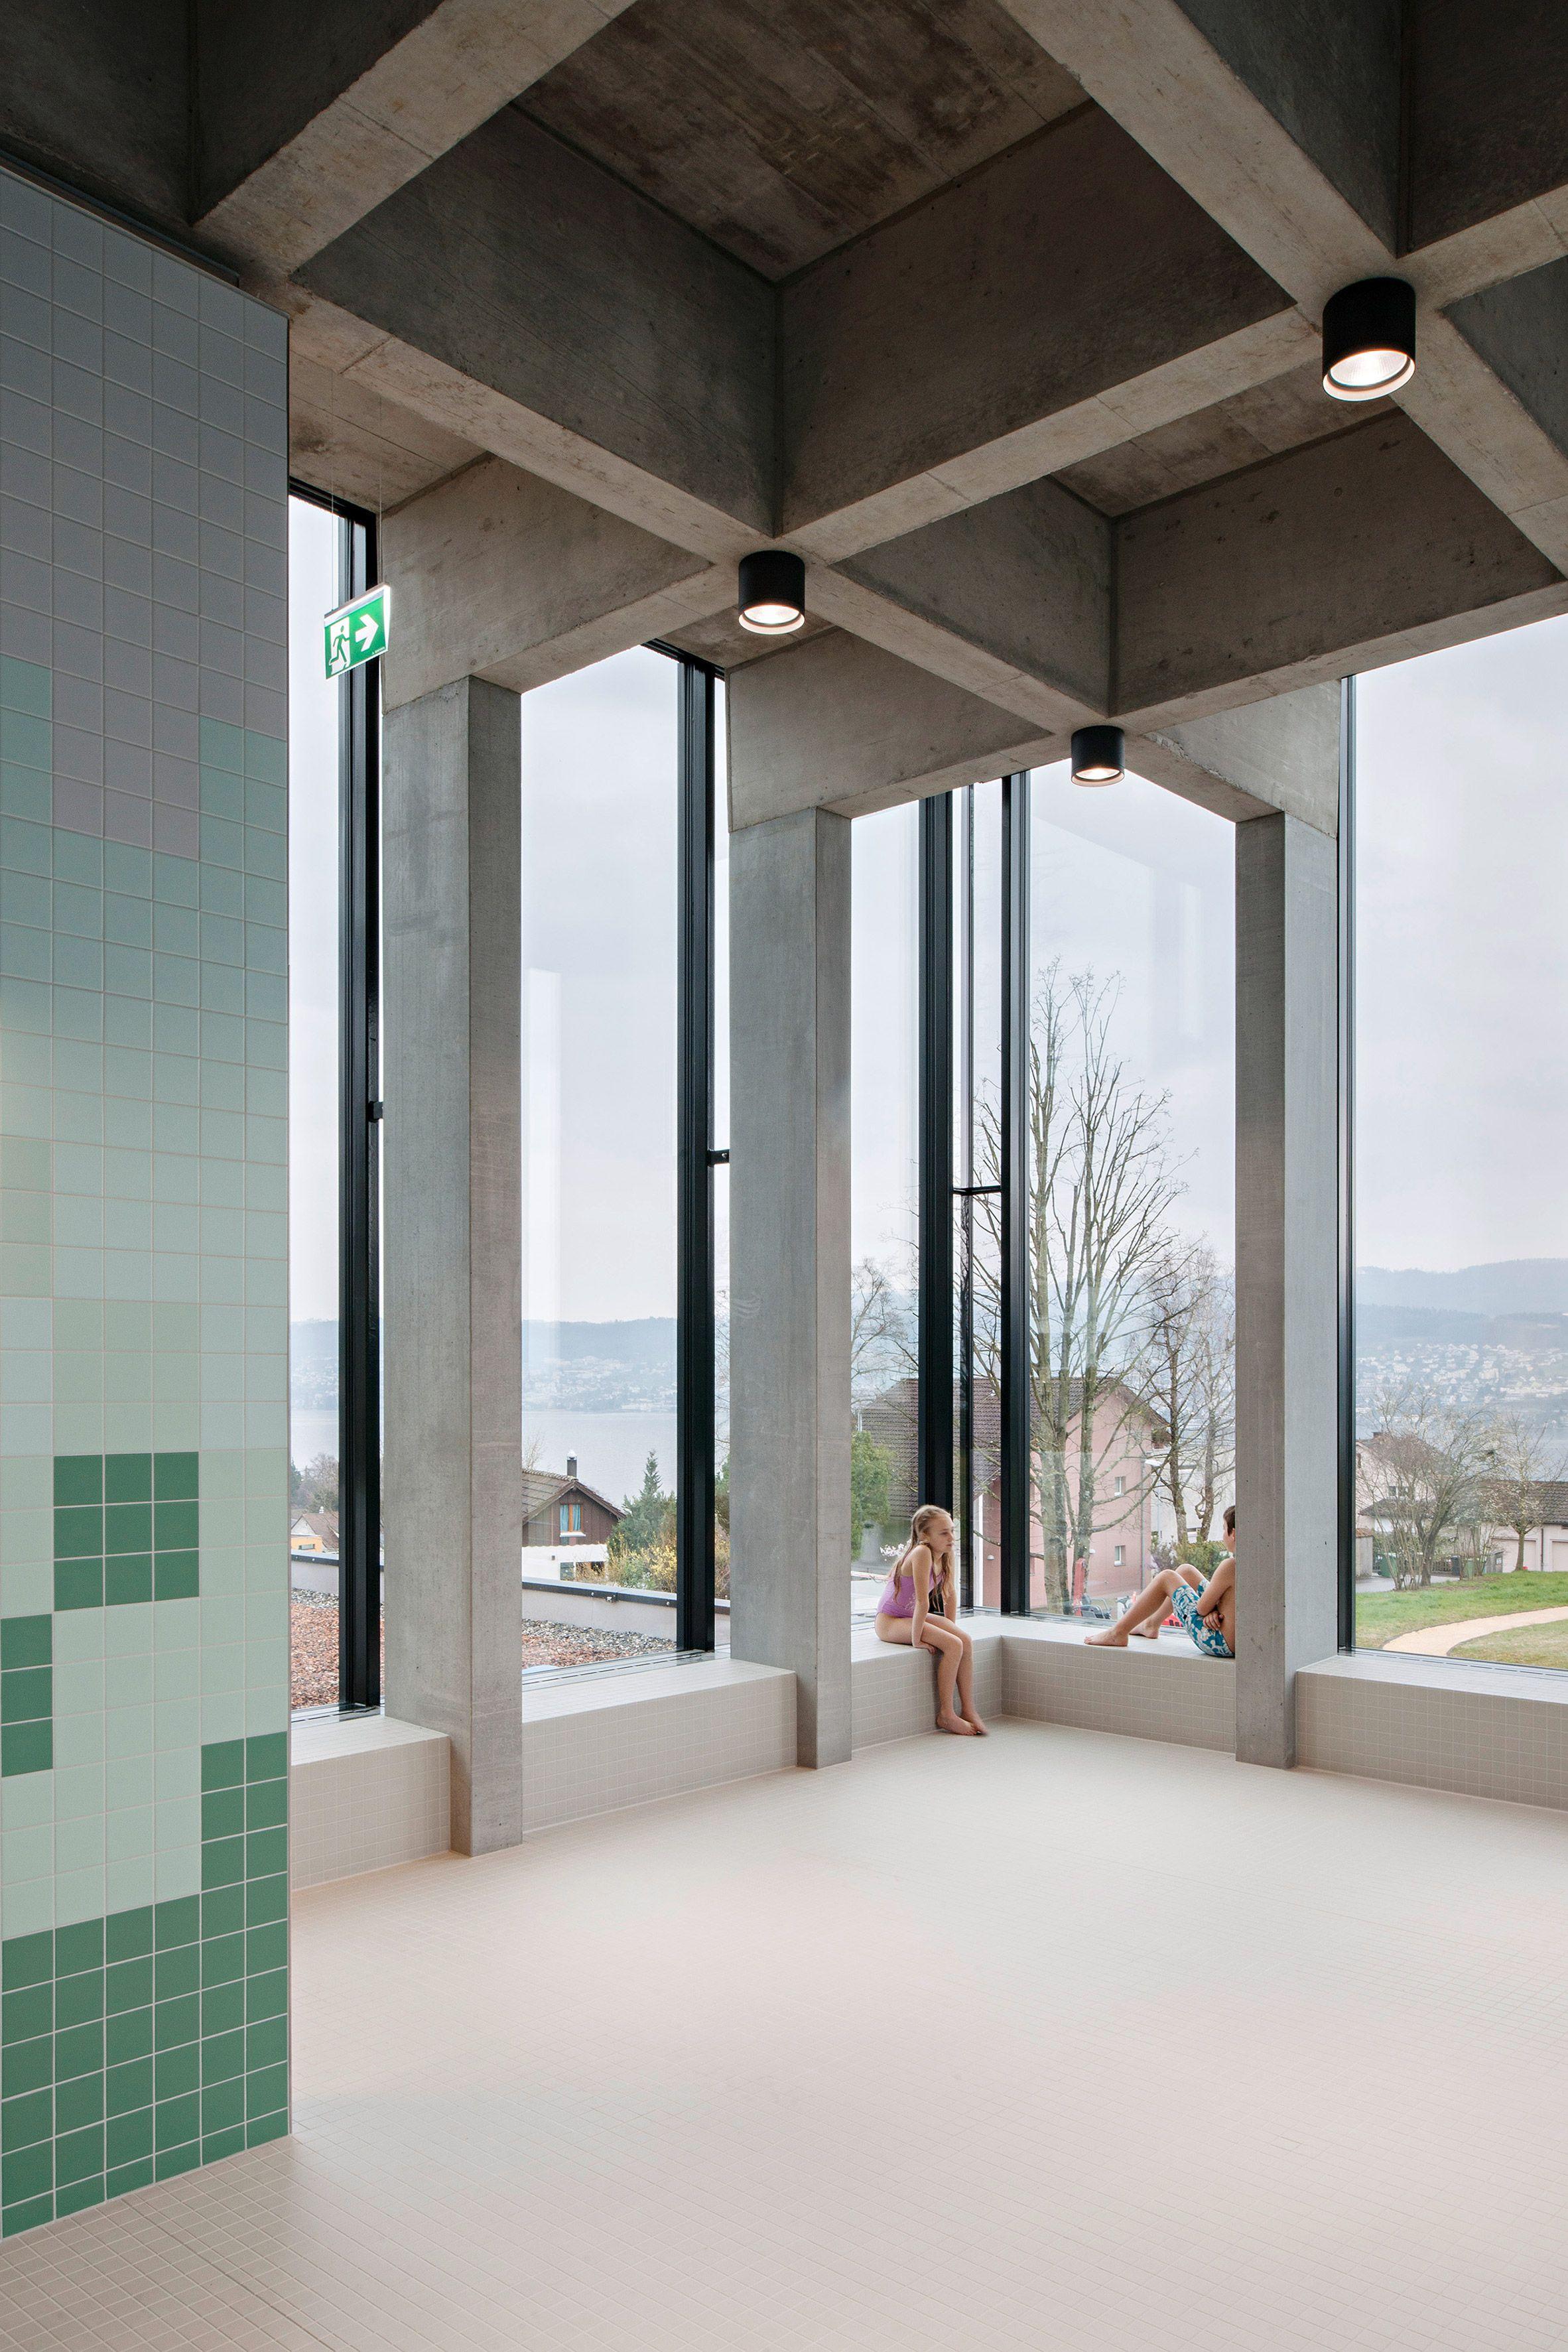 Frameless glass fin facade frameless glass sliding doors amp pool - Illiz Architektur Sets Children S Swimming Pool Above Former Underground Troop Billet In Zurich